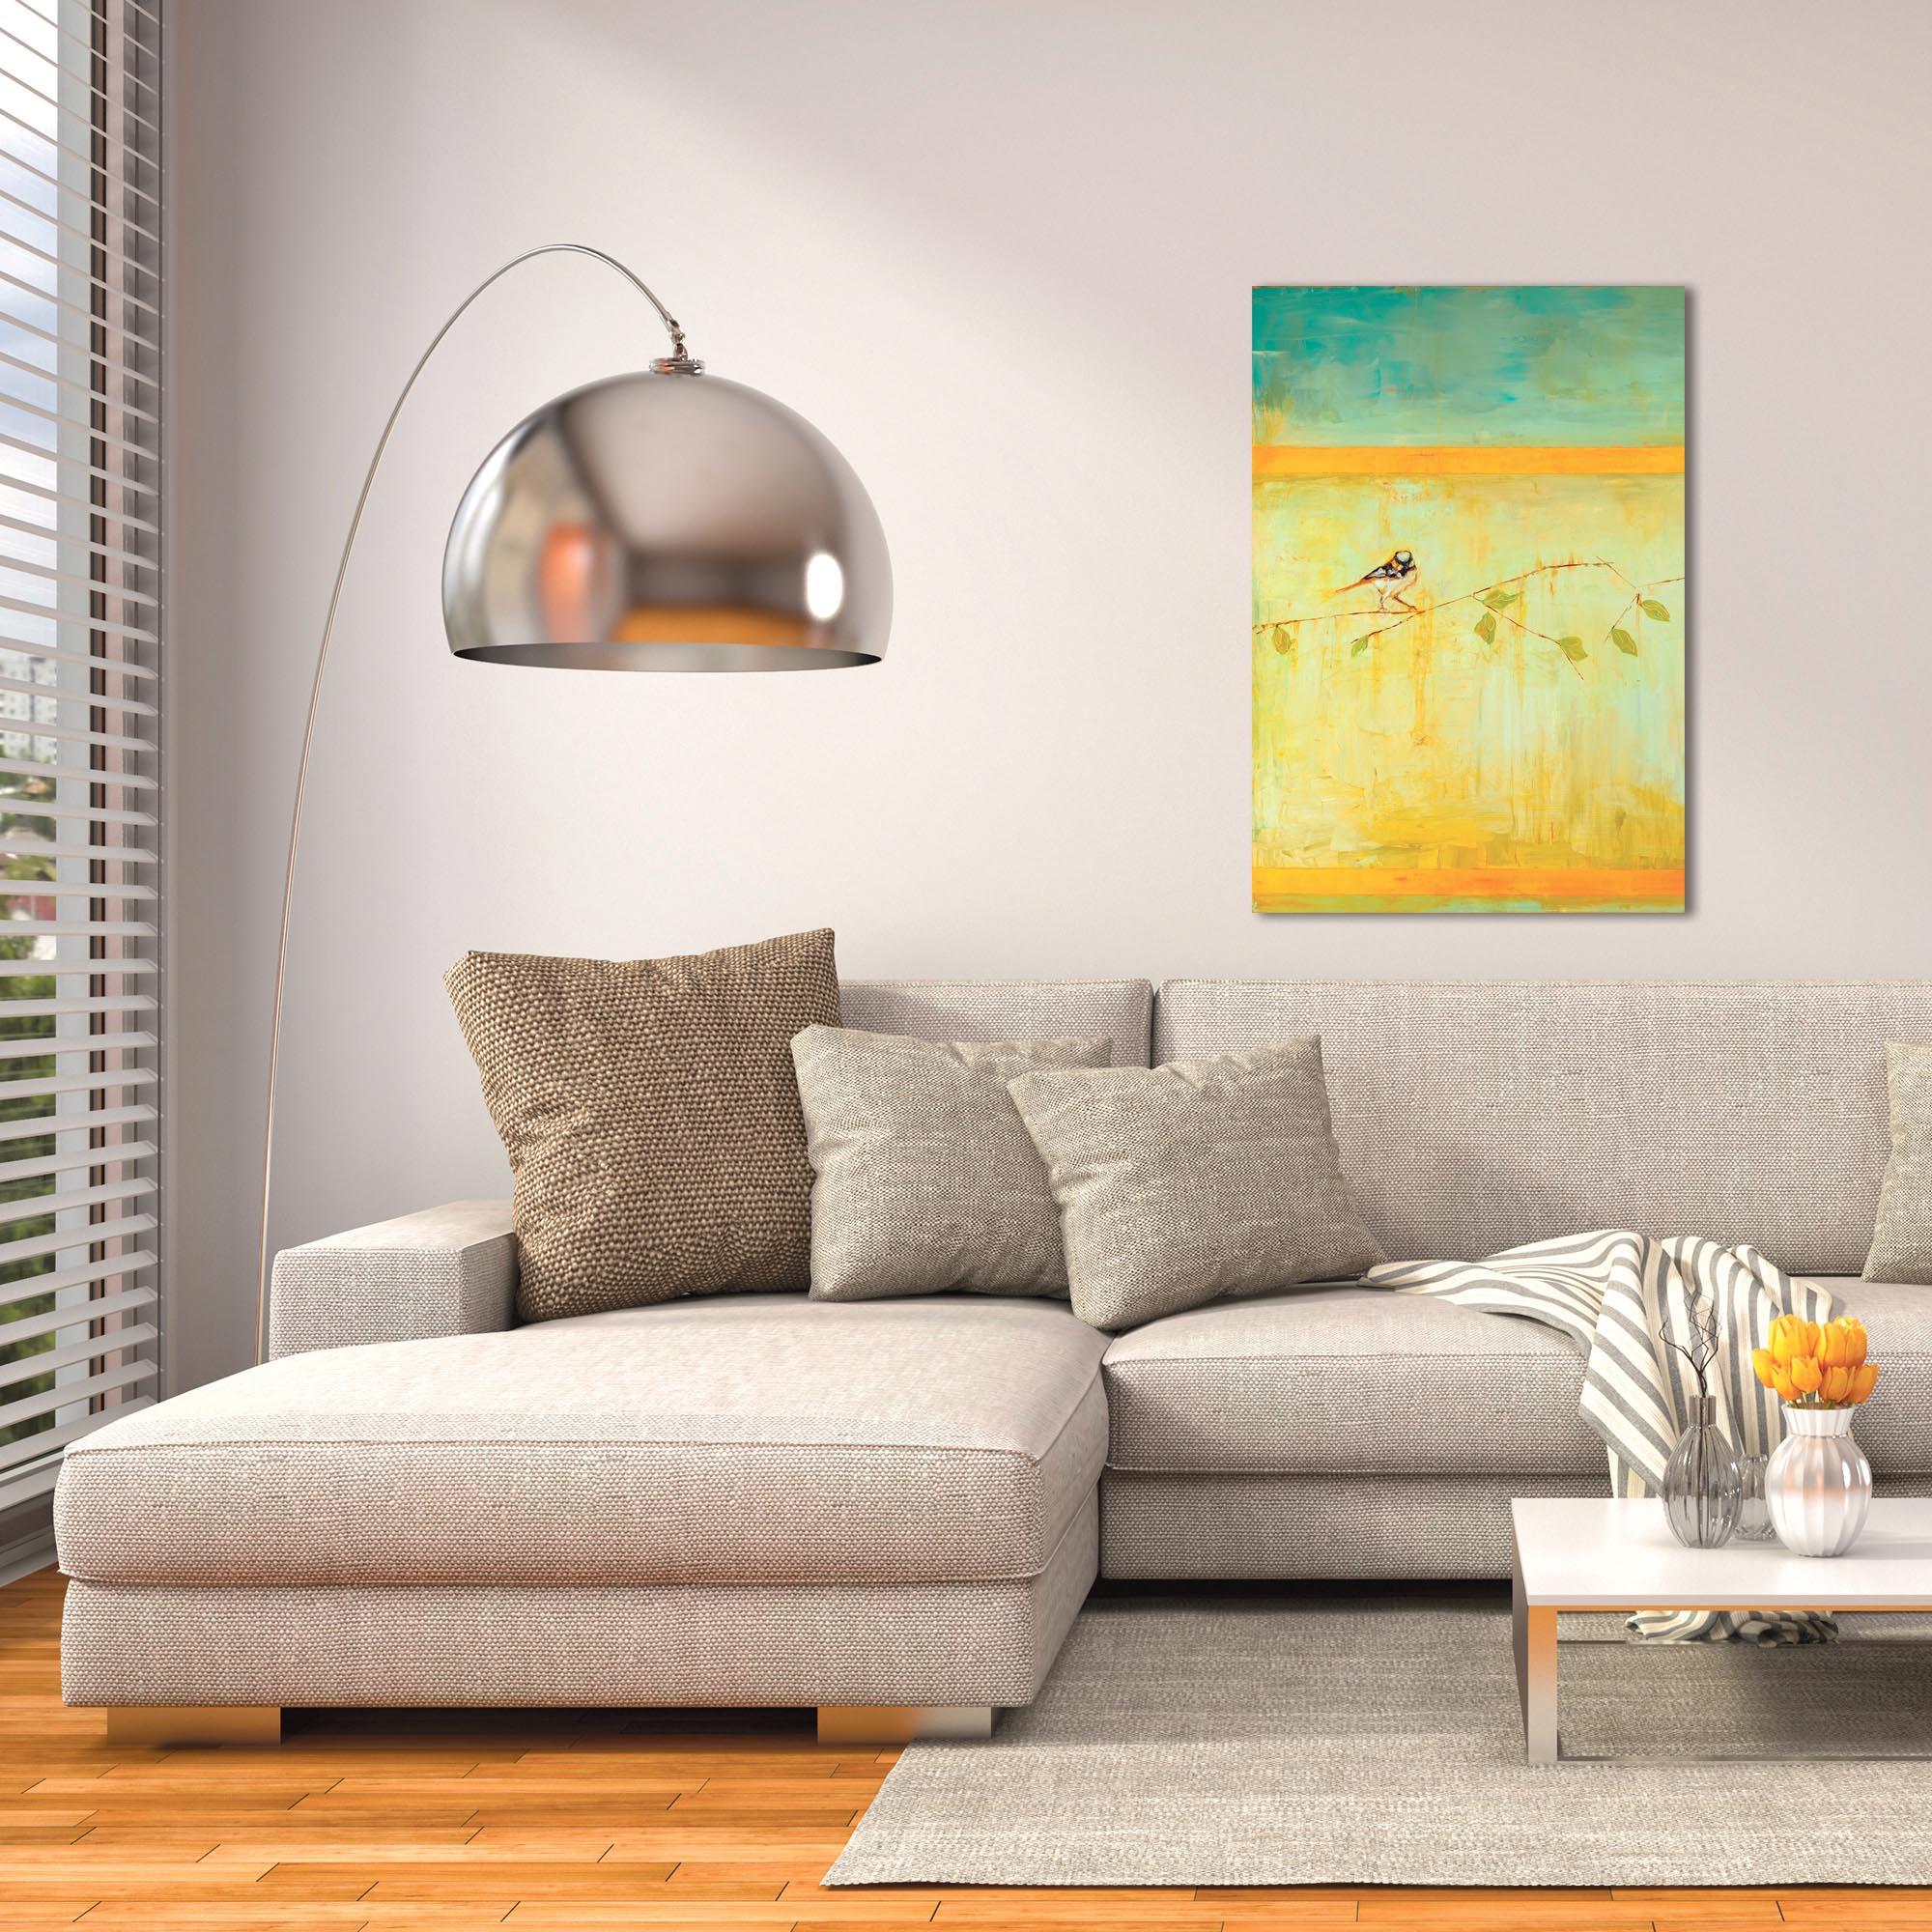 Contemporary Wall Art 'Bird with Horizontal Stripes v2' - Urban Birds Decor on Metal or Plexiglass - Lifestyle View